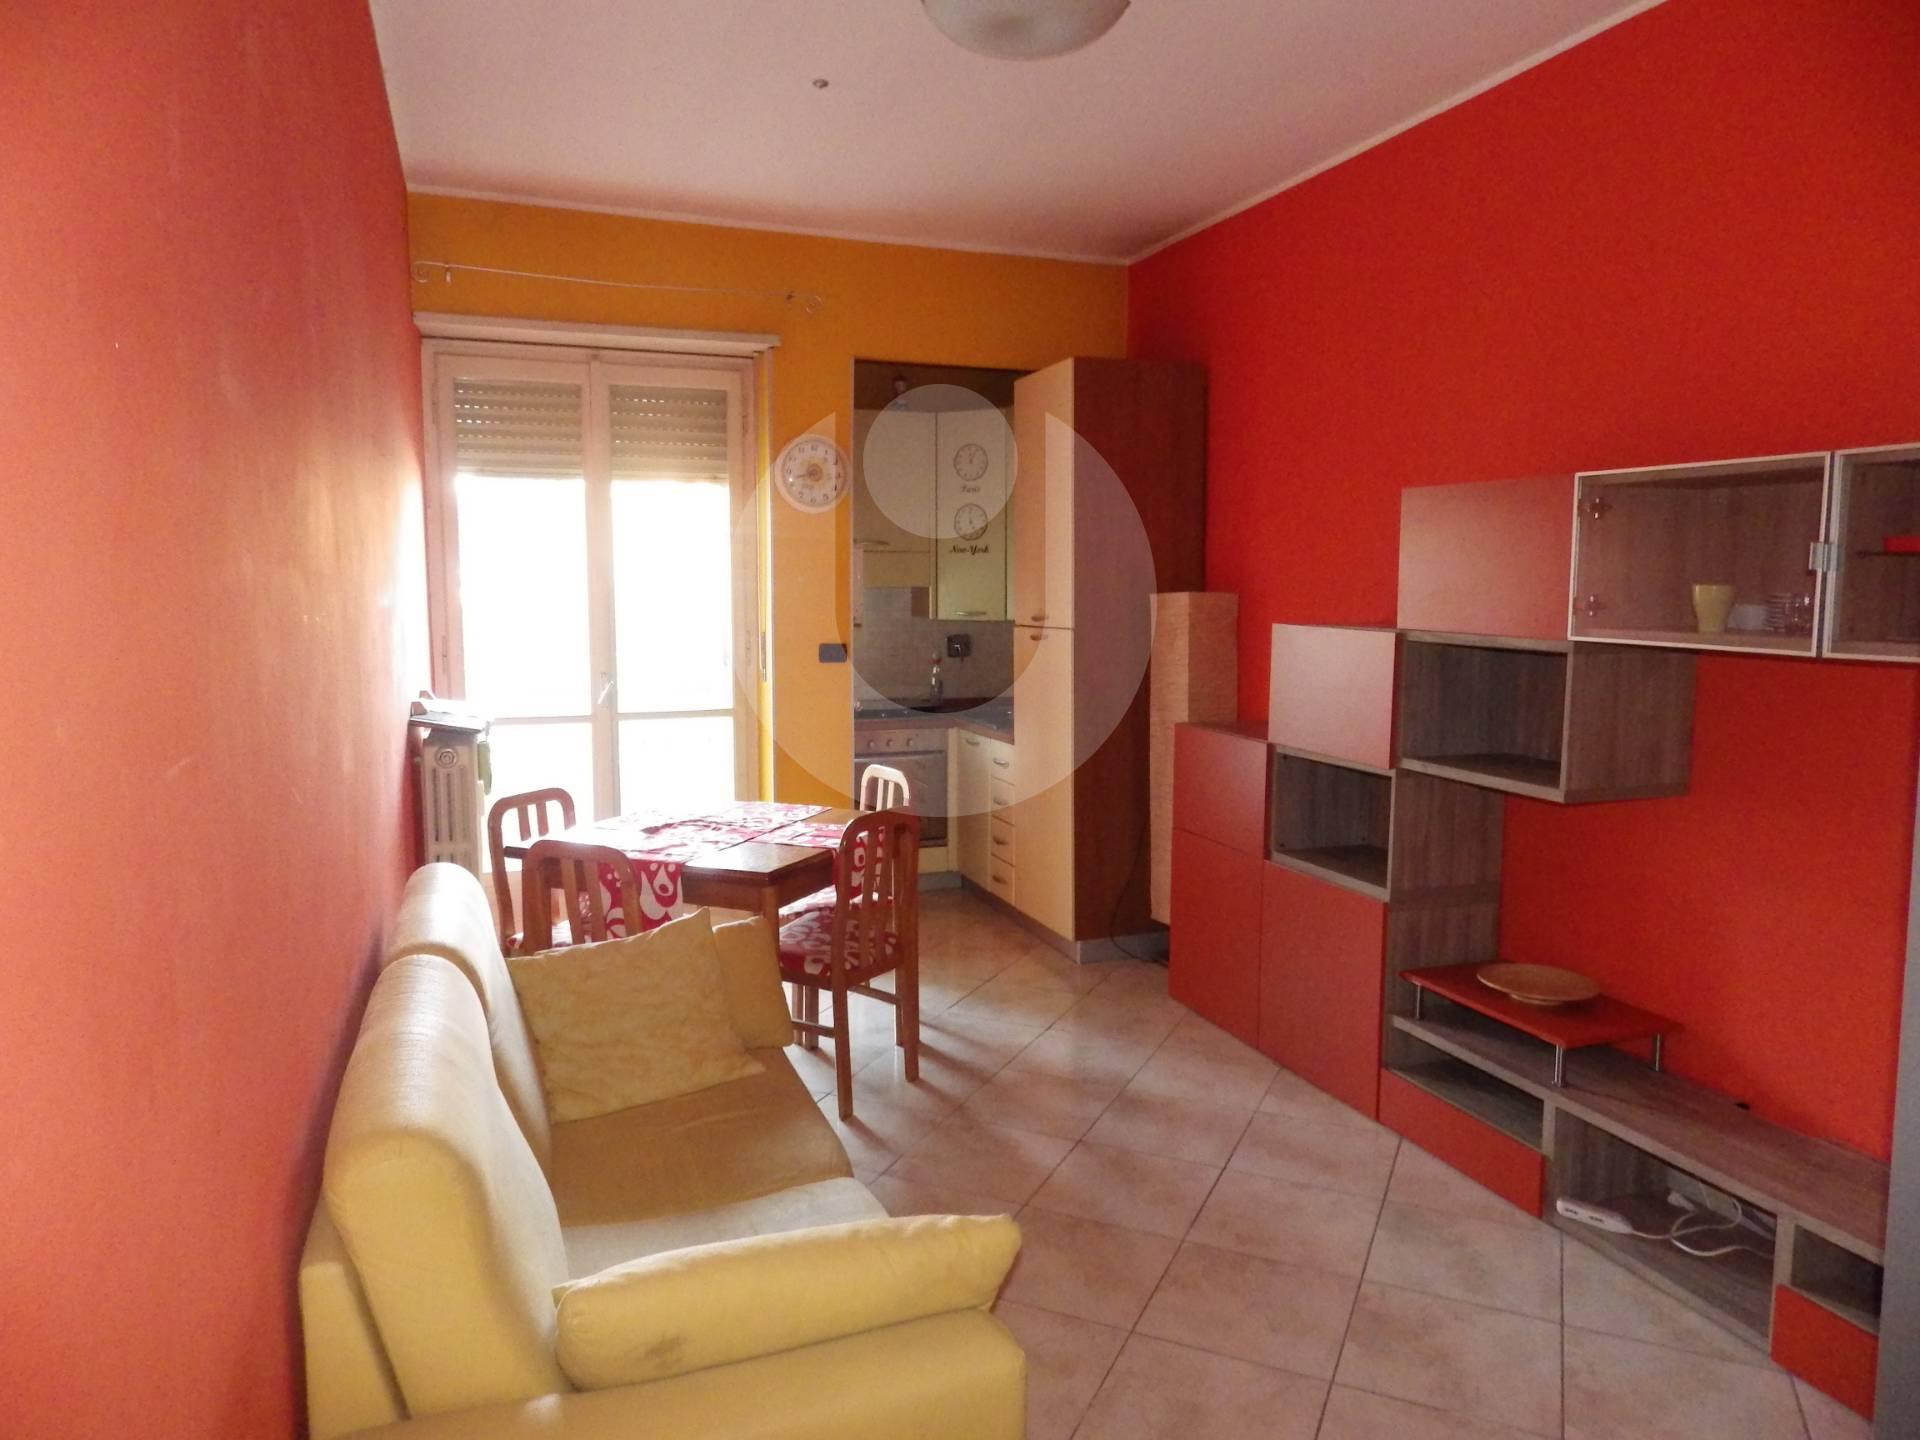 Foto 1 di Appartamento Via Giuseppe Timermans, Torino